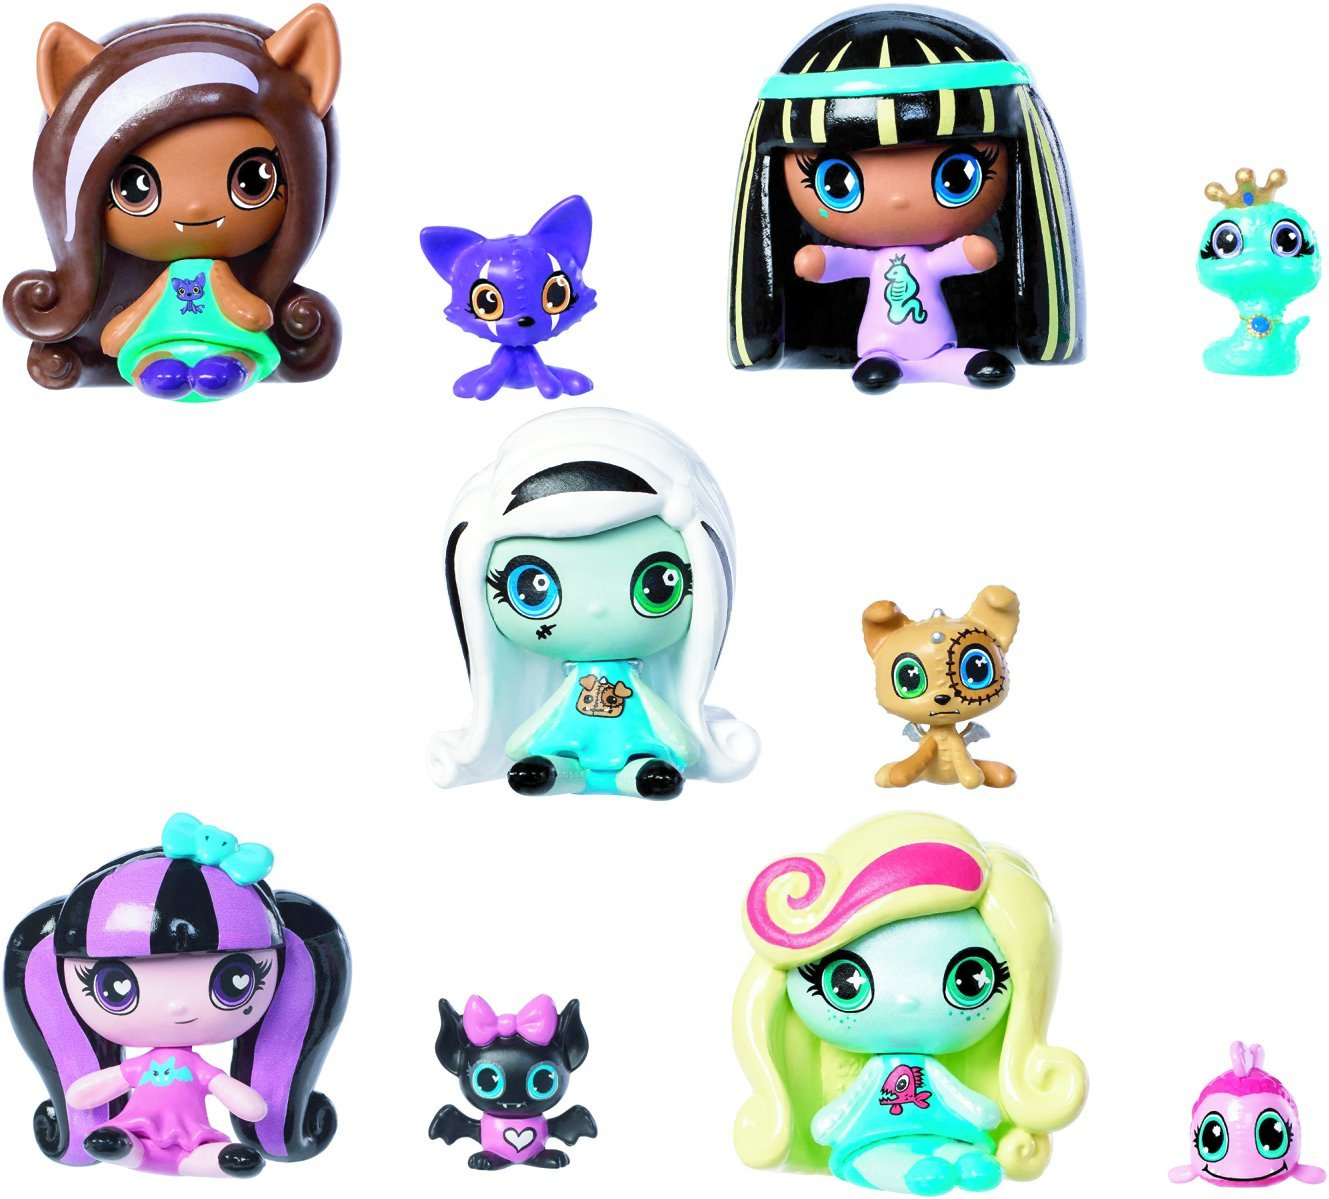 Monster High Minis Draculaura Frankie Stein Clawdeen Wolf Cleo De Nile Lagoona Pets 5 Set